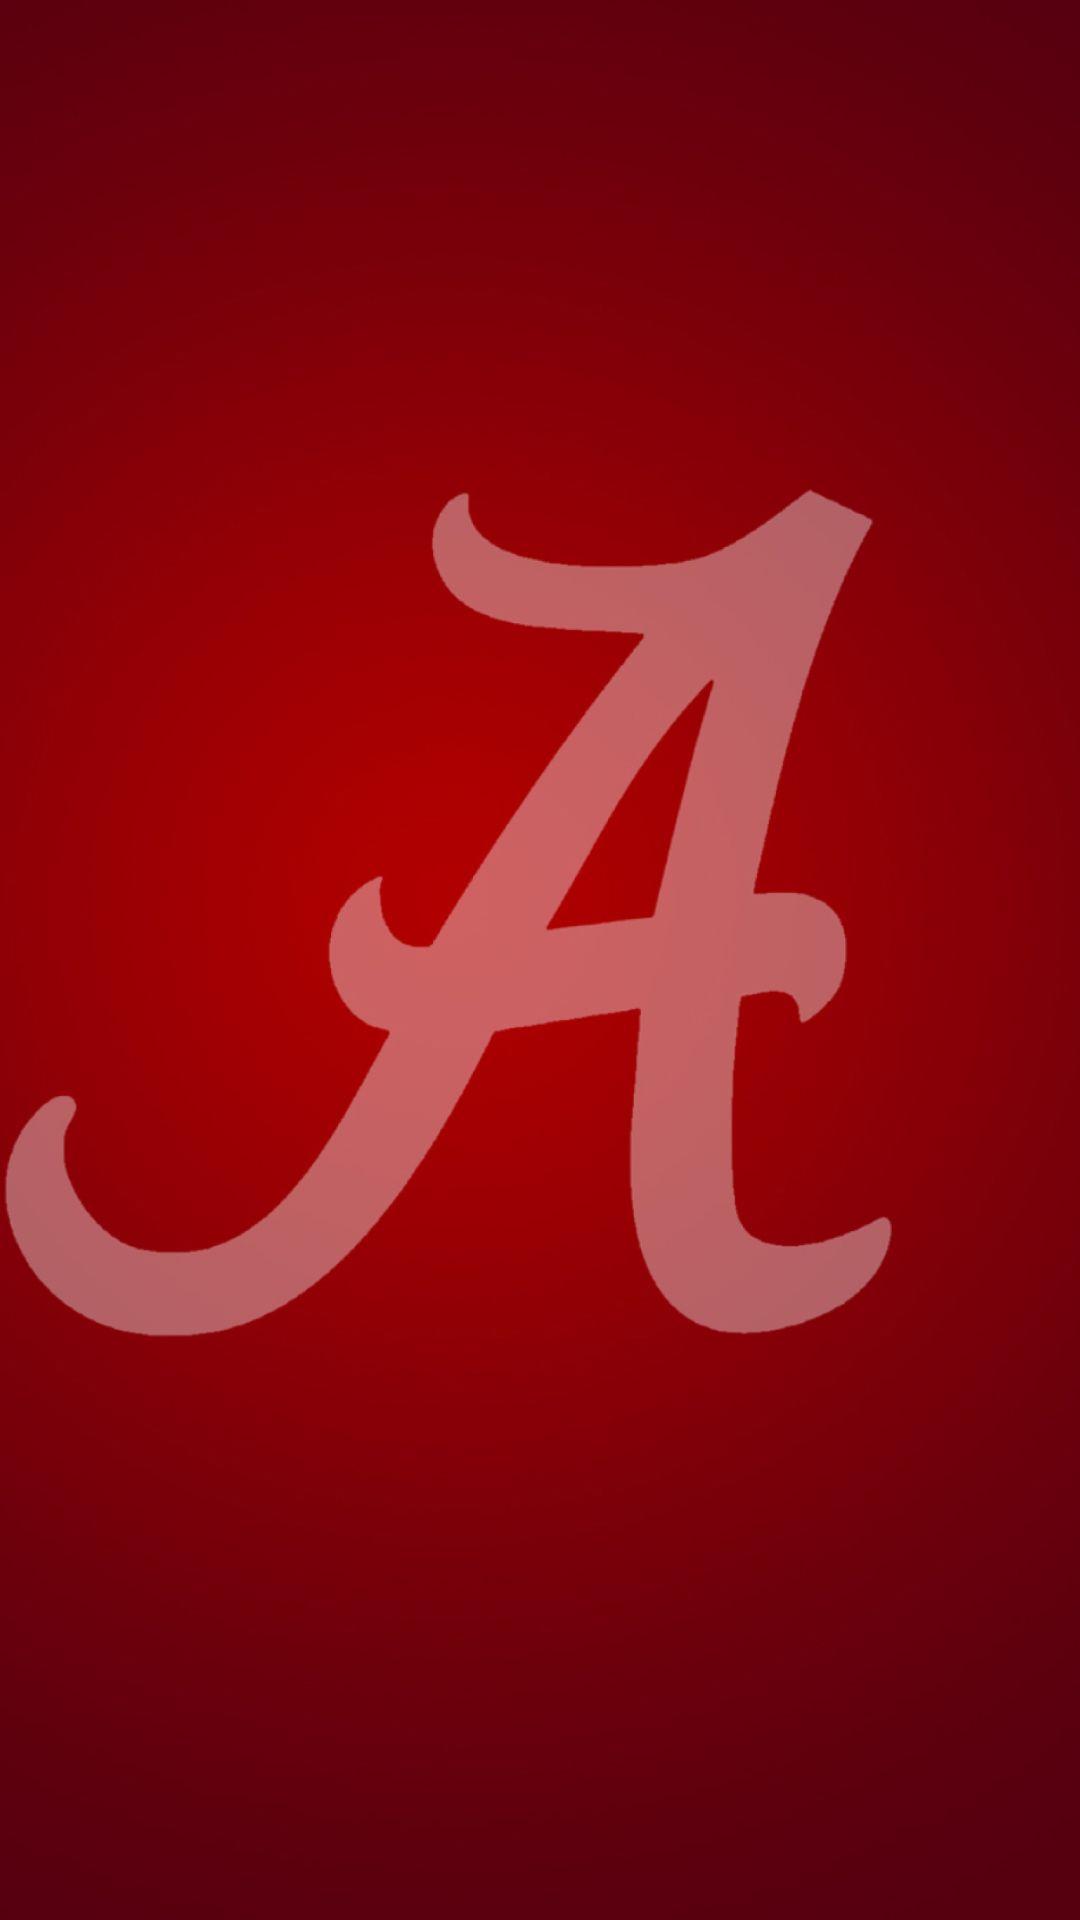 AlabamaFootballWallpaperHDforAndroidjpg 10801920 bama